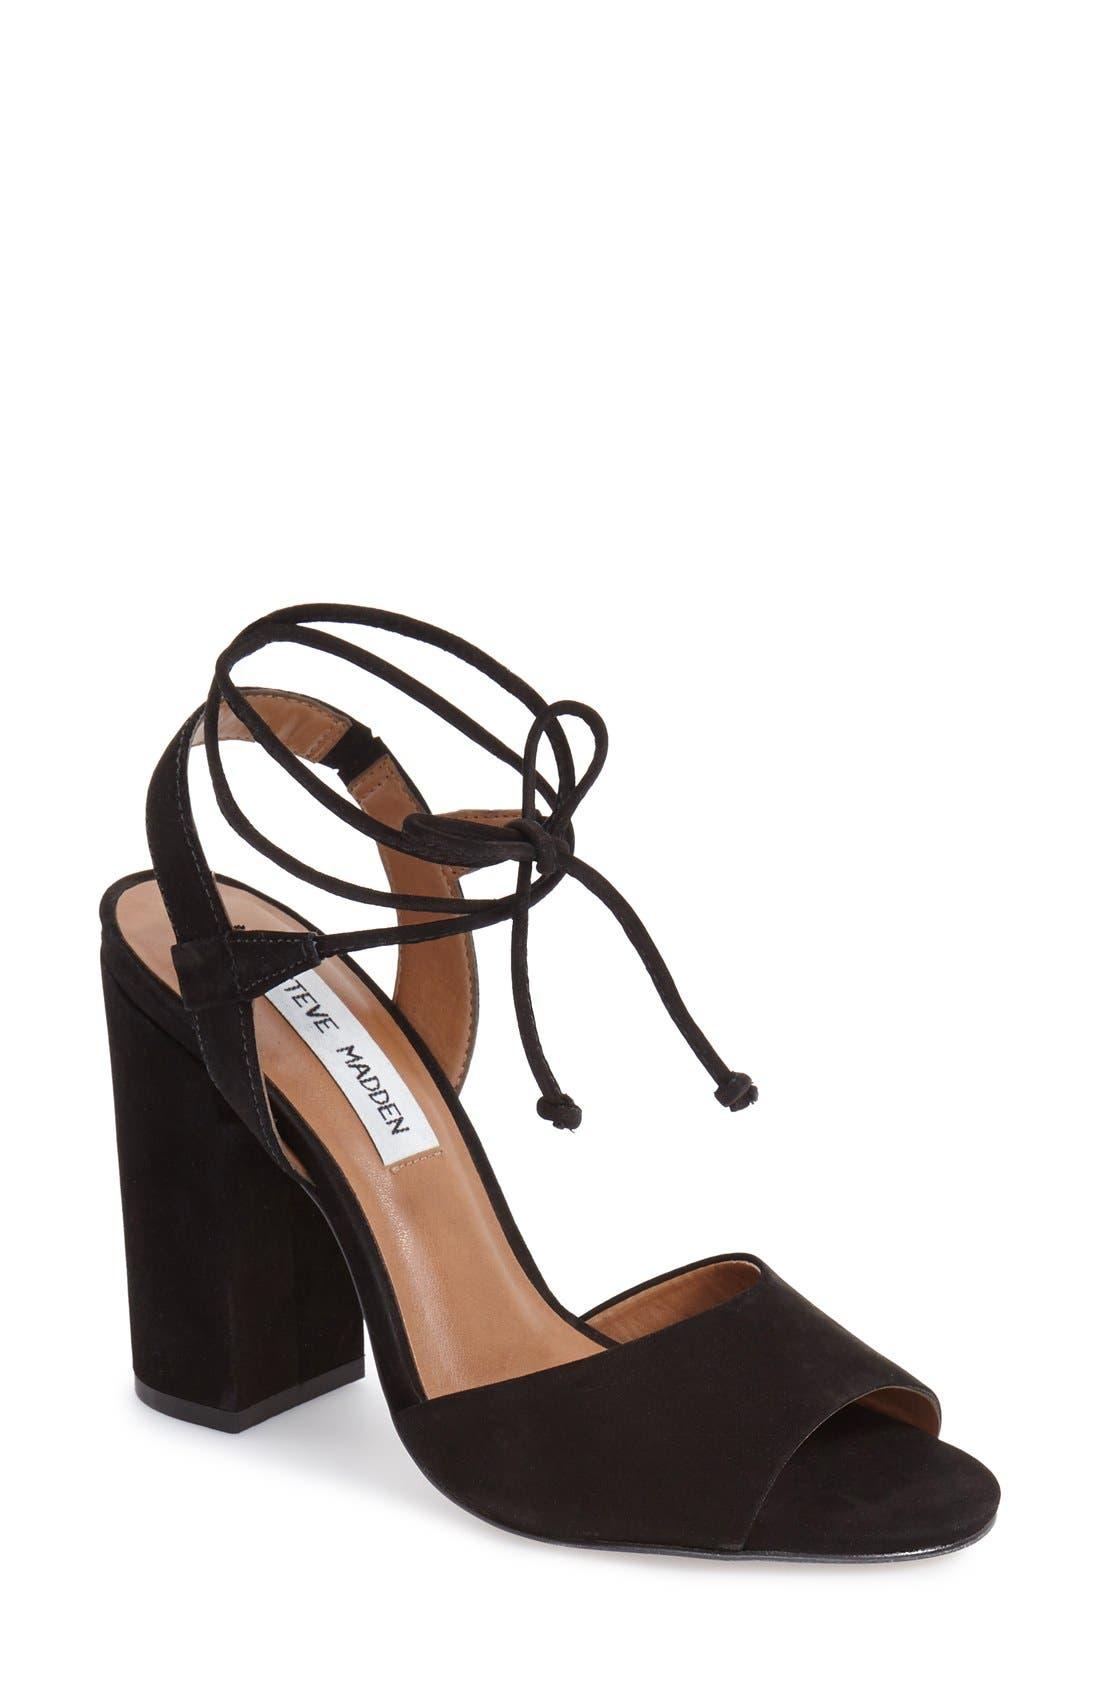 Main Image - Steve Madden 'Serrina' Block Heel Lace Up Sandal (Women)